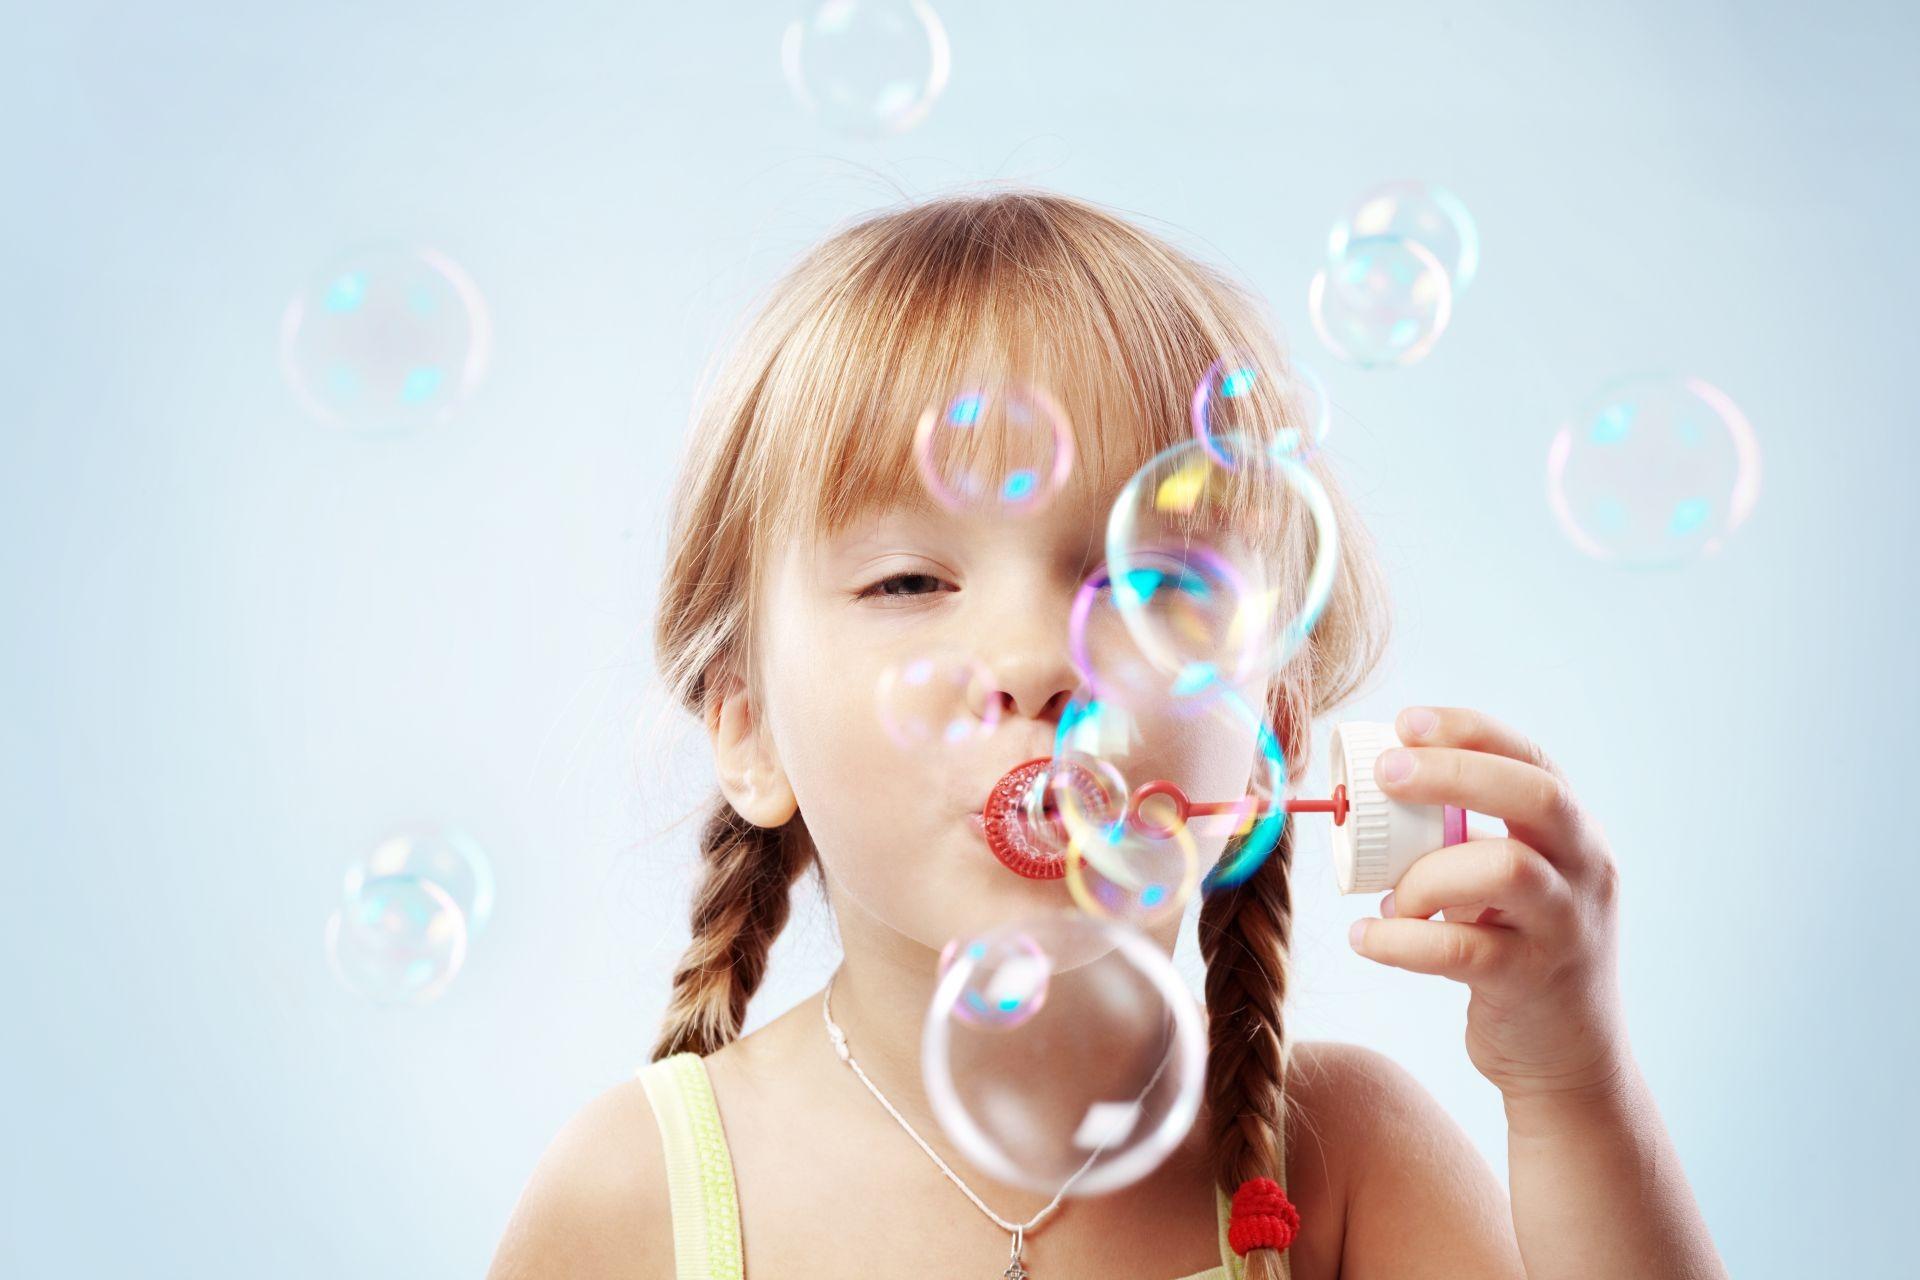 Bubbles children милой девочкой Cute little girl childho ... Занятие Любовью Красиво